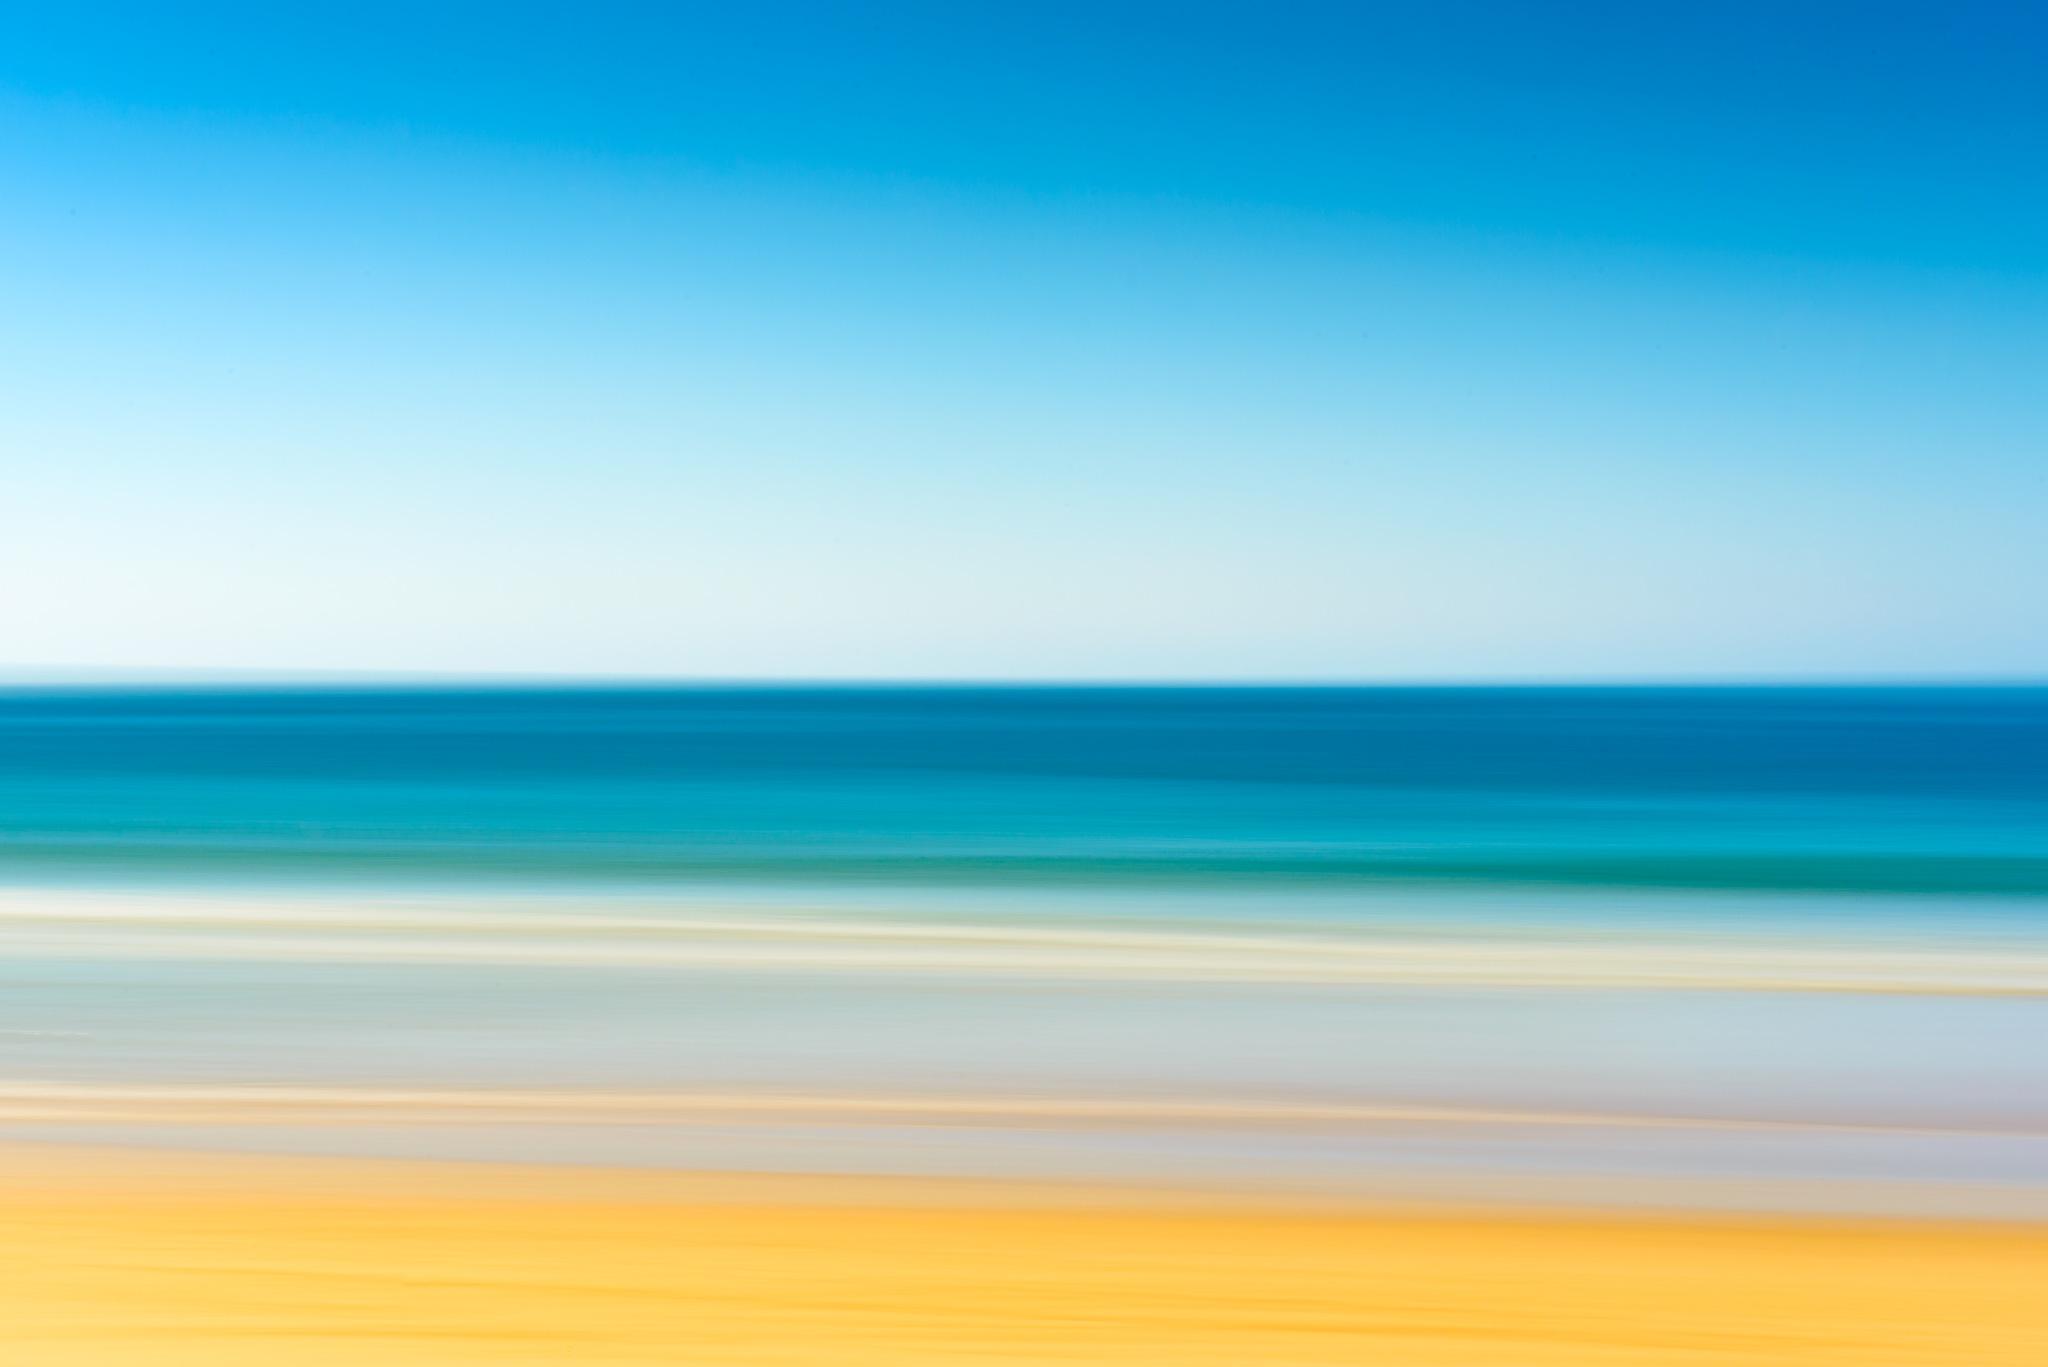 Just Sand Sea Sky by Marcel Weichert